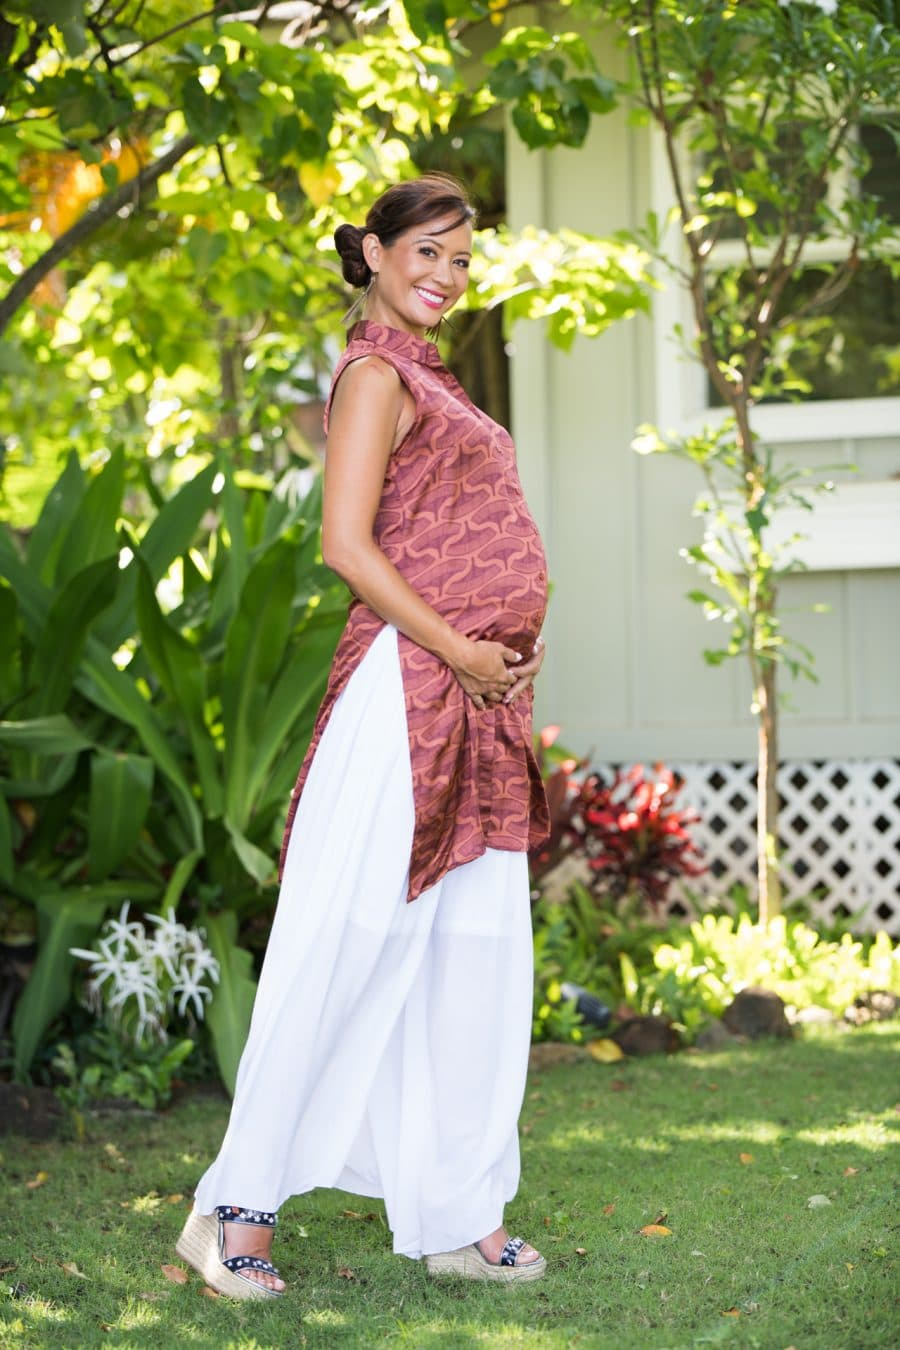 Model wearing Wiliwili Top in Copper Red/Mahagony Peahi Moi